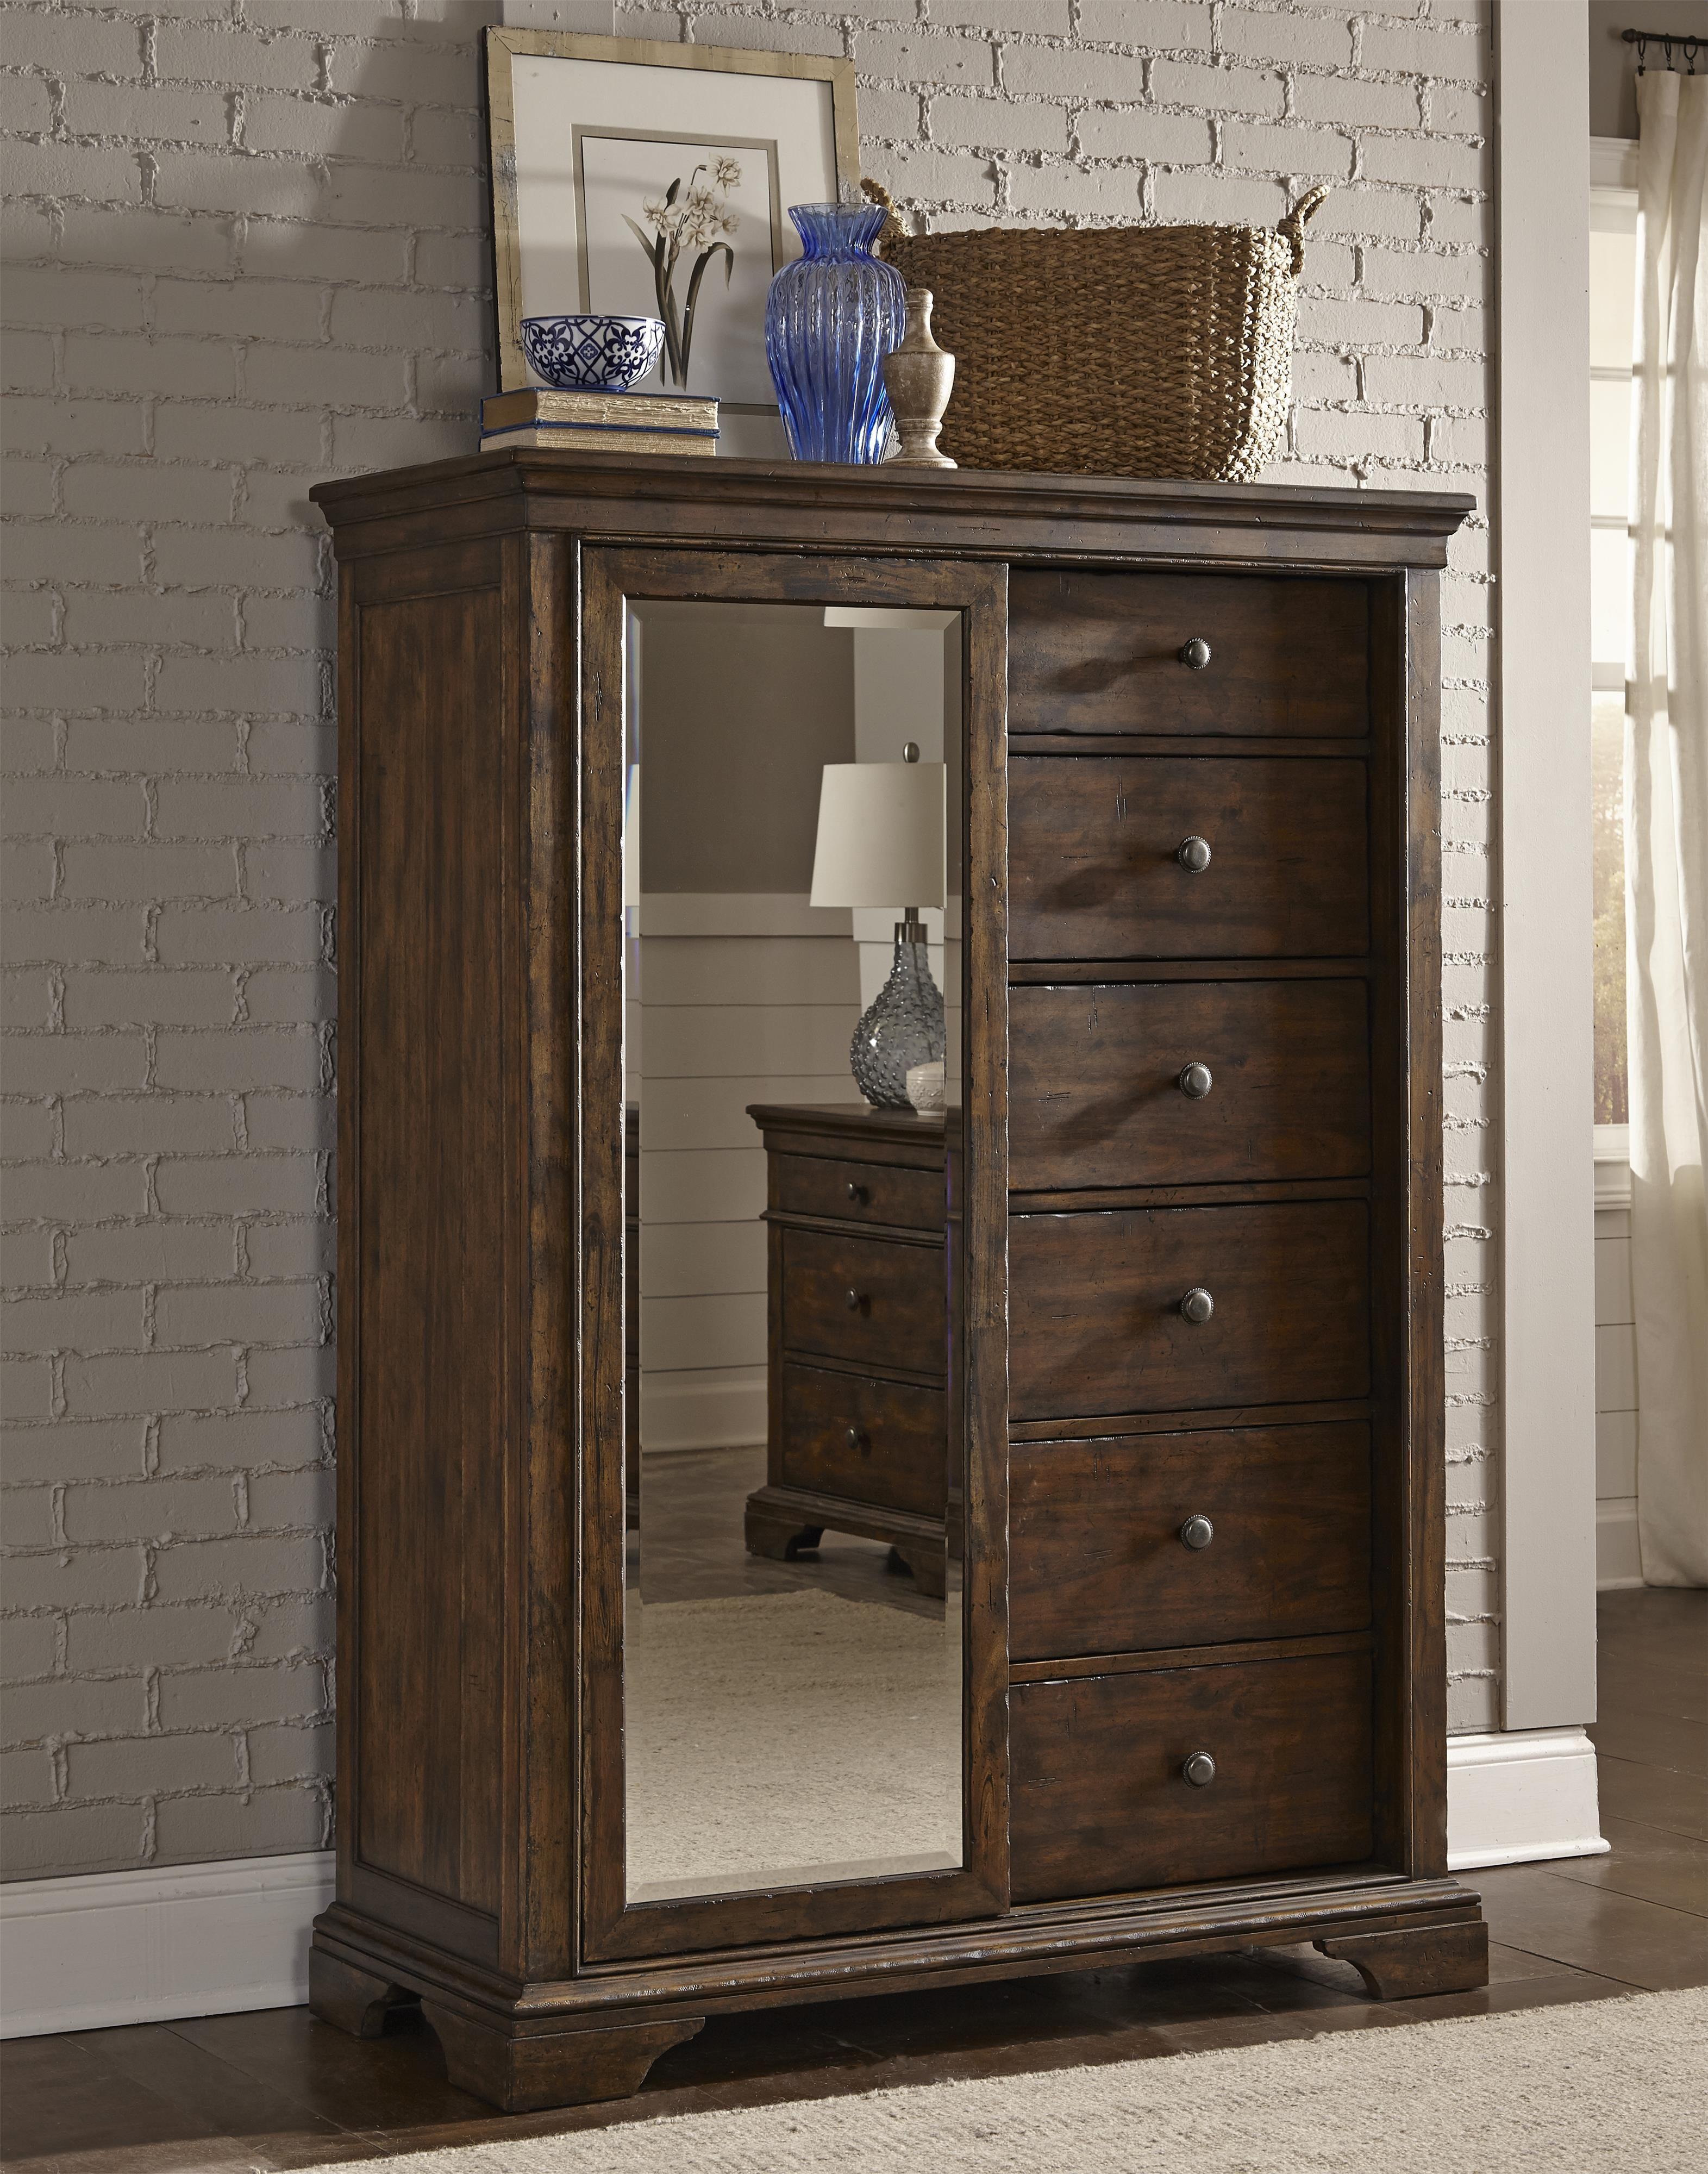 Trisha Yearwood Home Tulsa Sliding Door Chest With Mirror By Trisha Yearwood Home Collection By